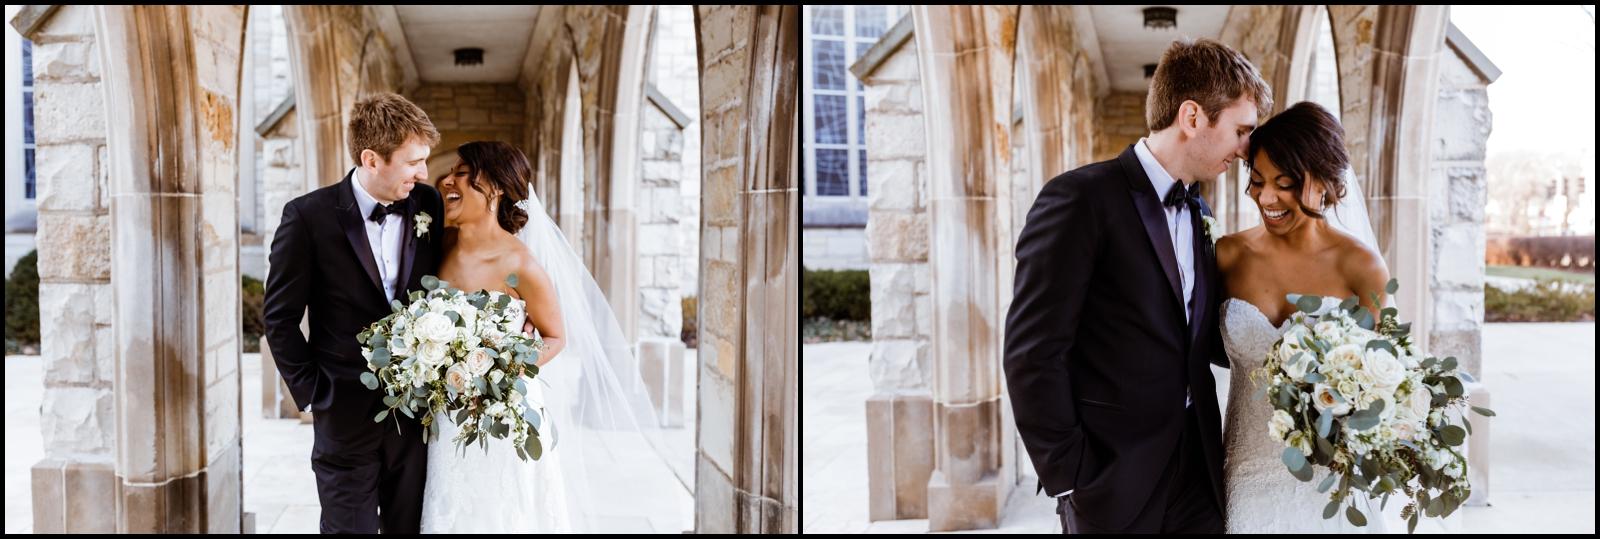 Chicago Wedding- Alice Millar Chapel Ceremony, London House Reception_0084.jpg